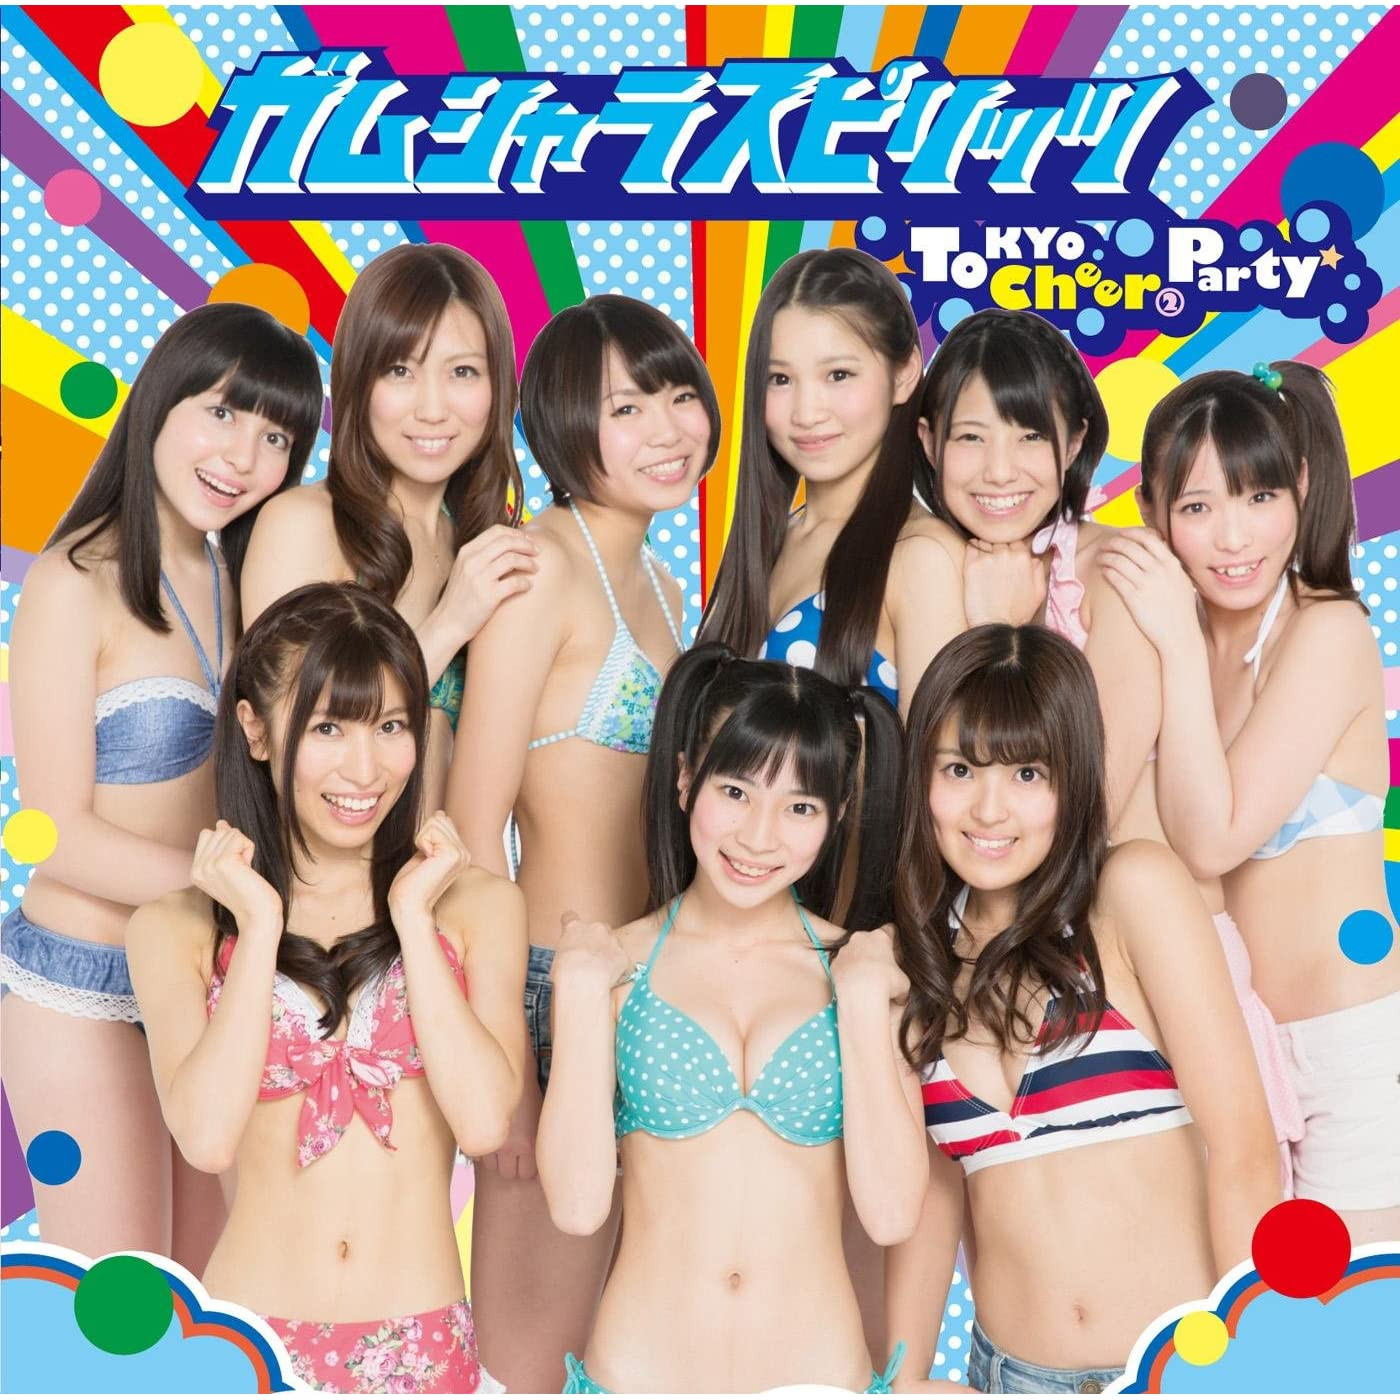 Tokyo Cheer2 Party Susume! Fresh Man